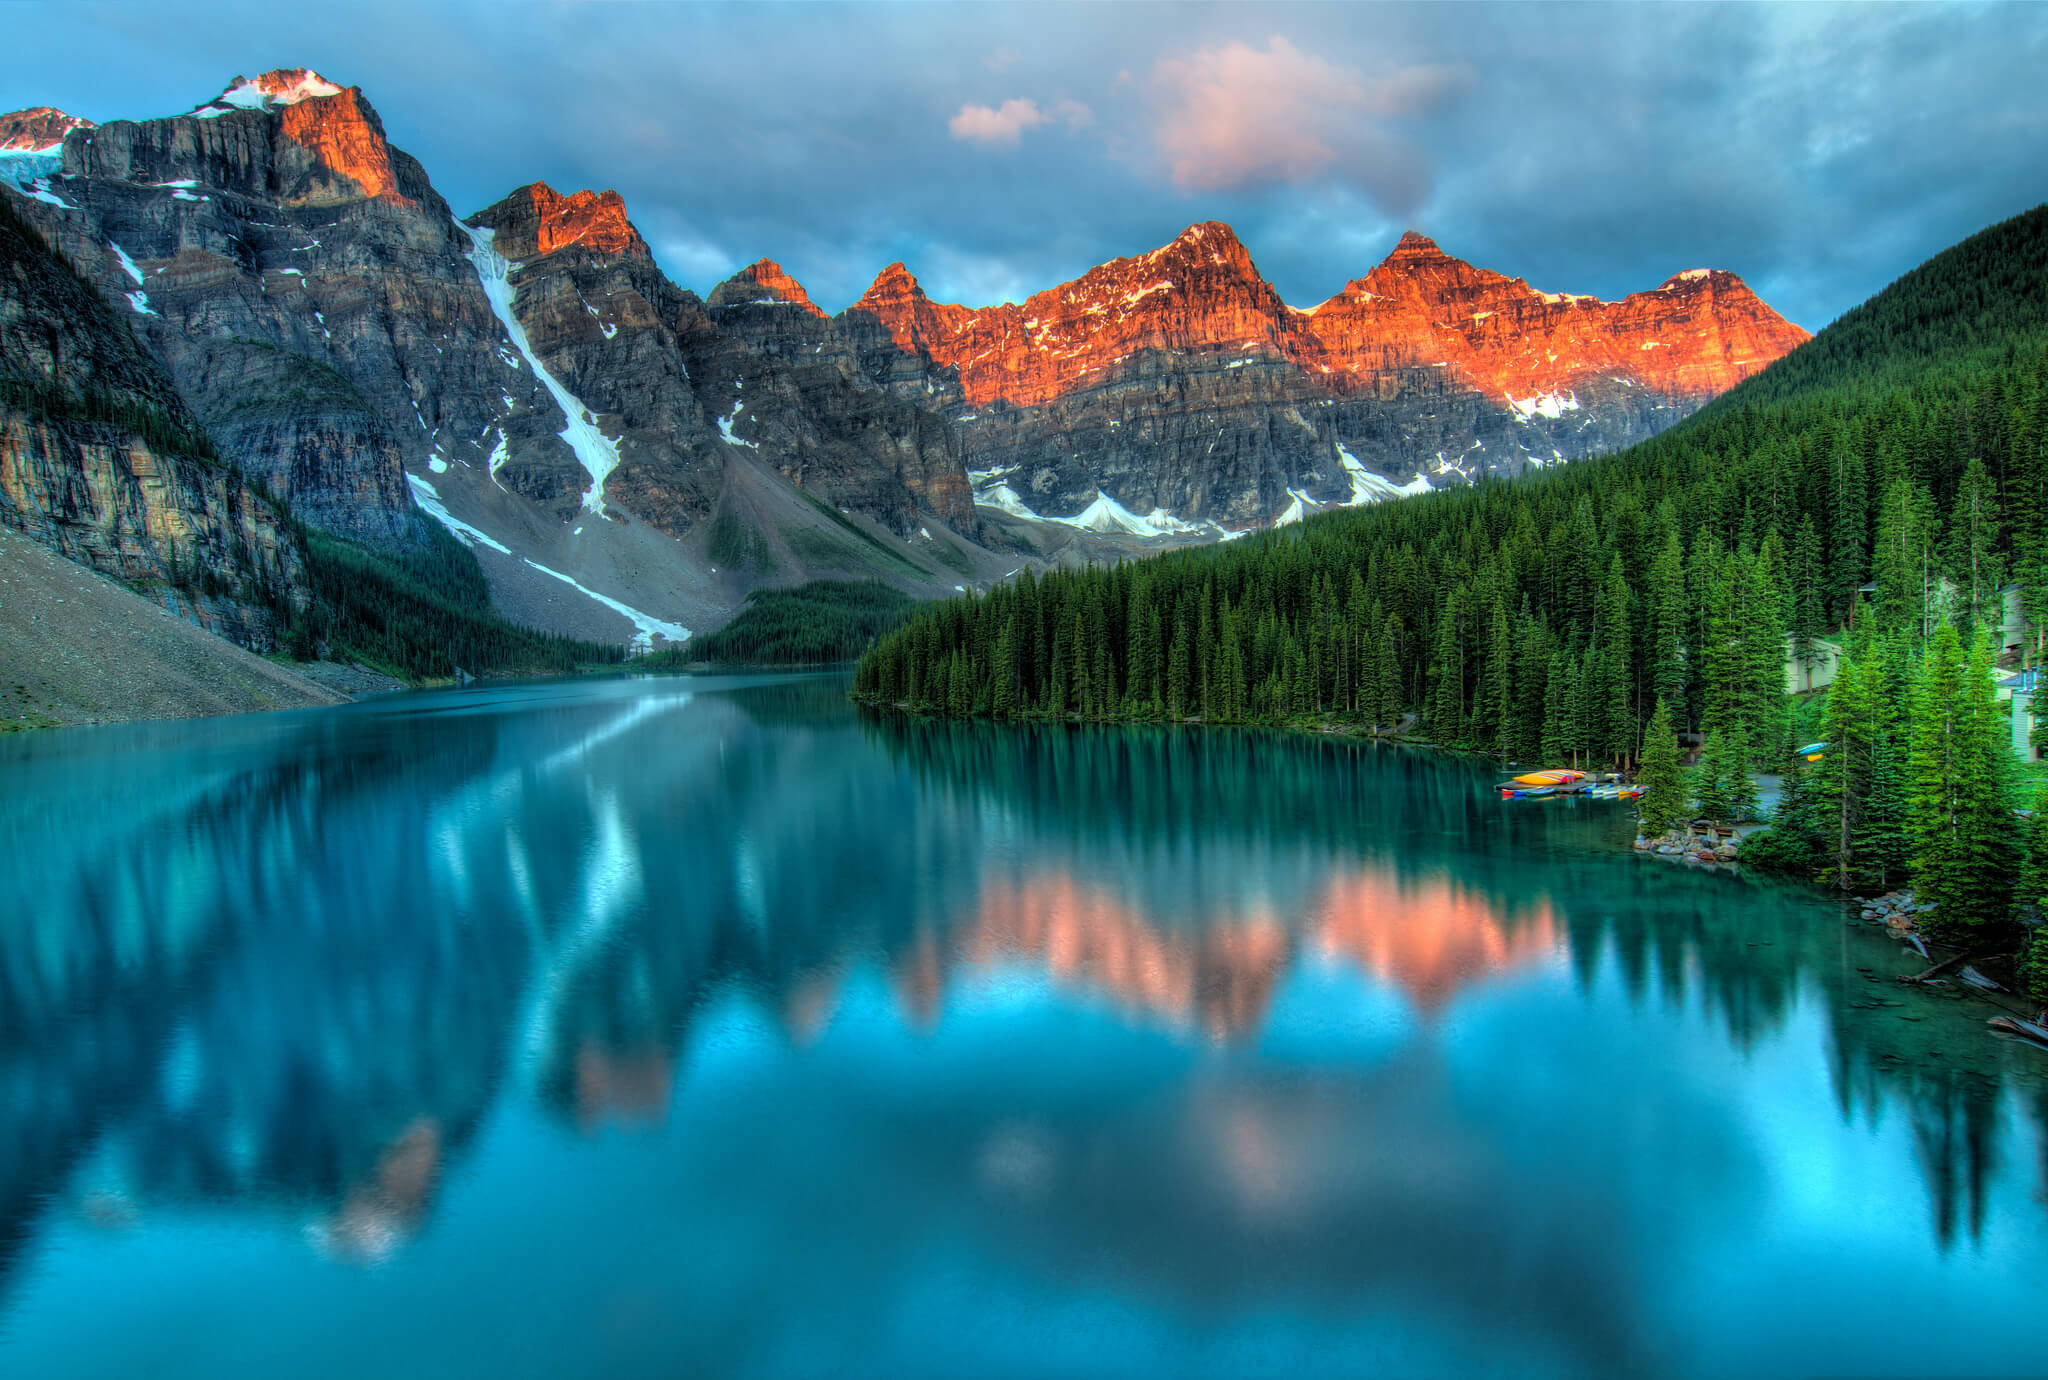 班夫國家公園 Banff National Park